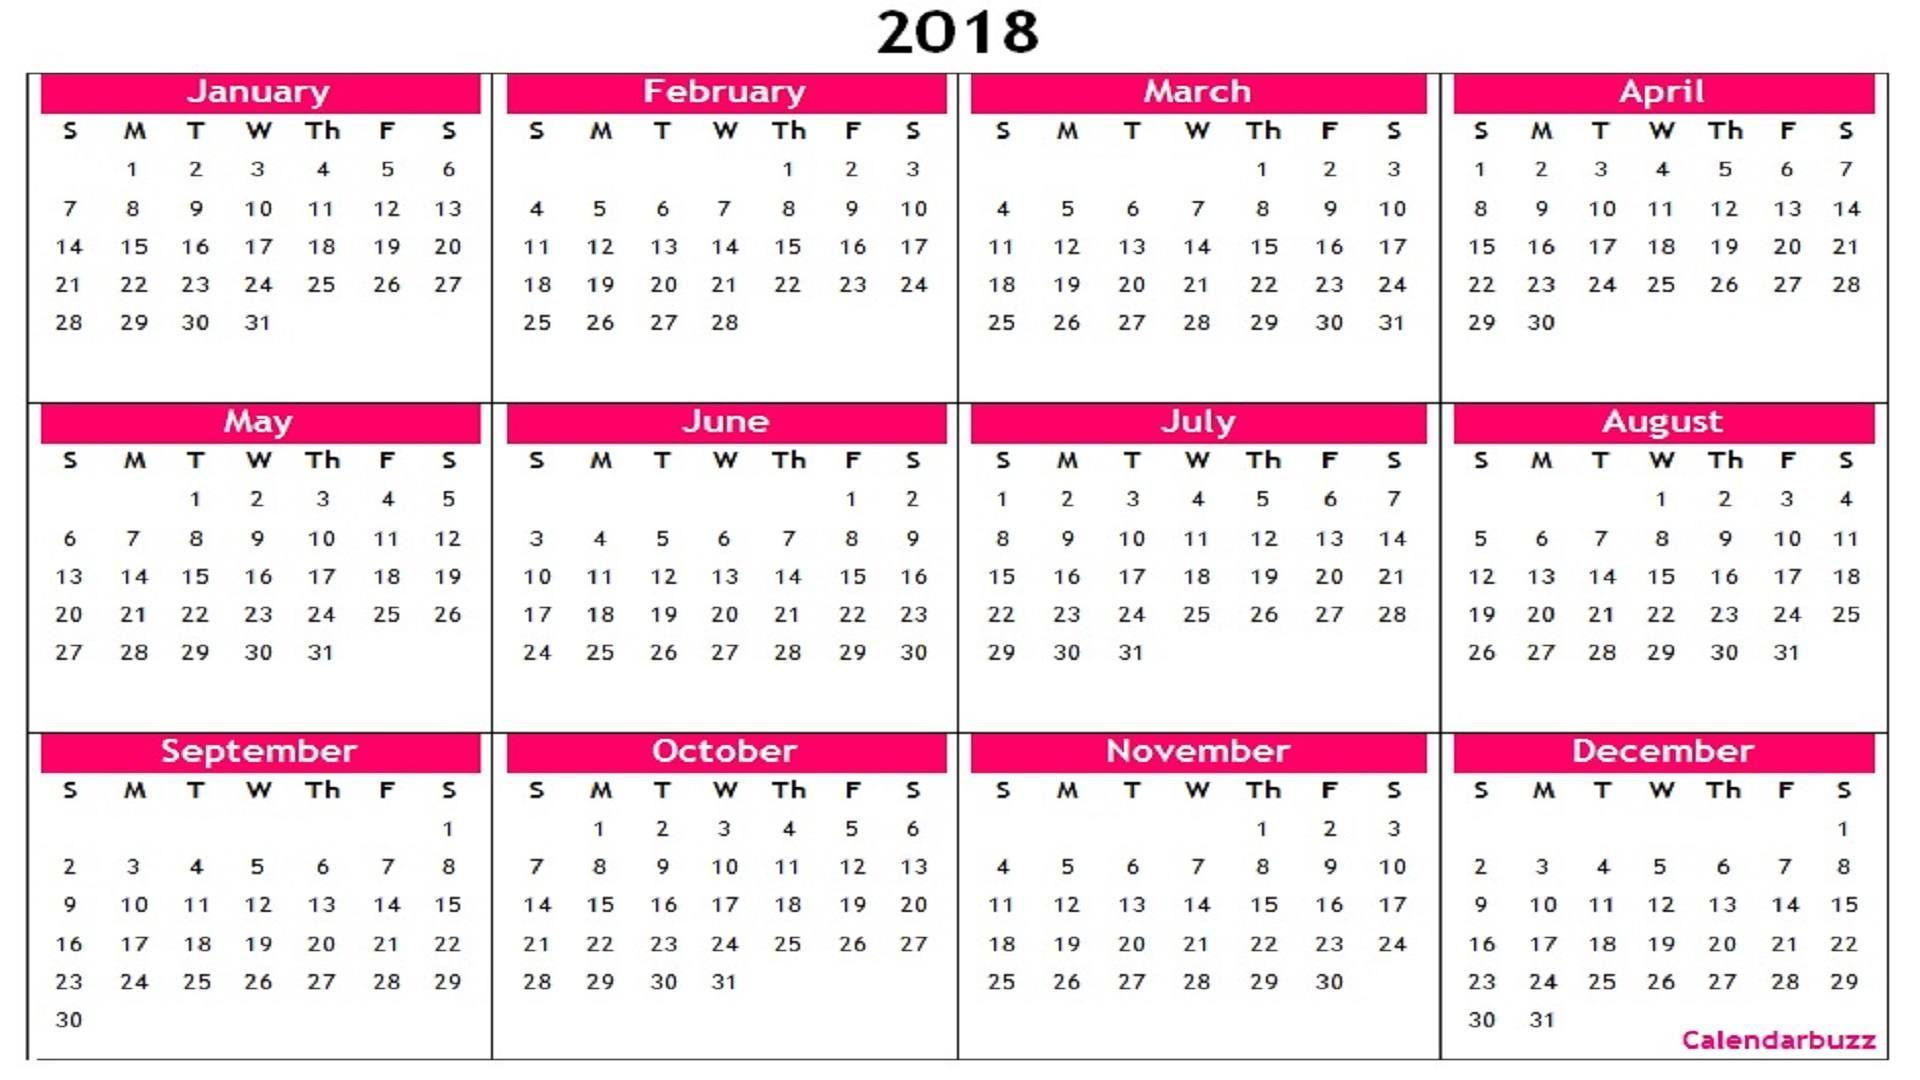 Philippines 2018 Calendar Printable 2018 Printable Calendars Pinterest